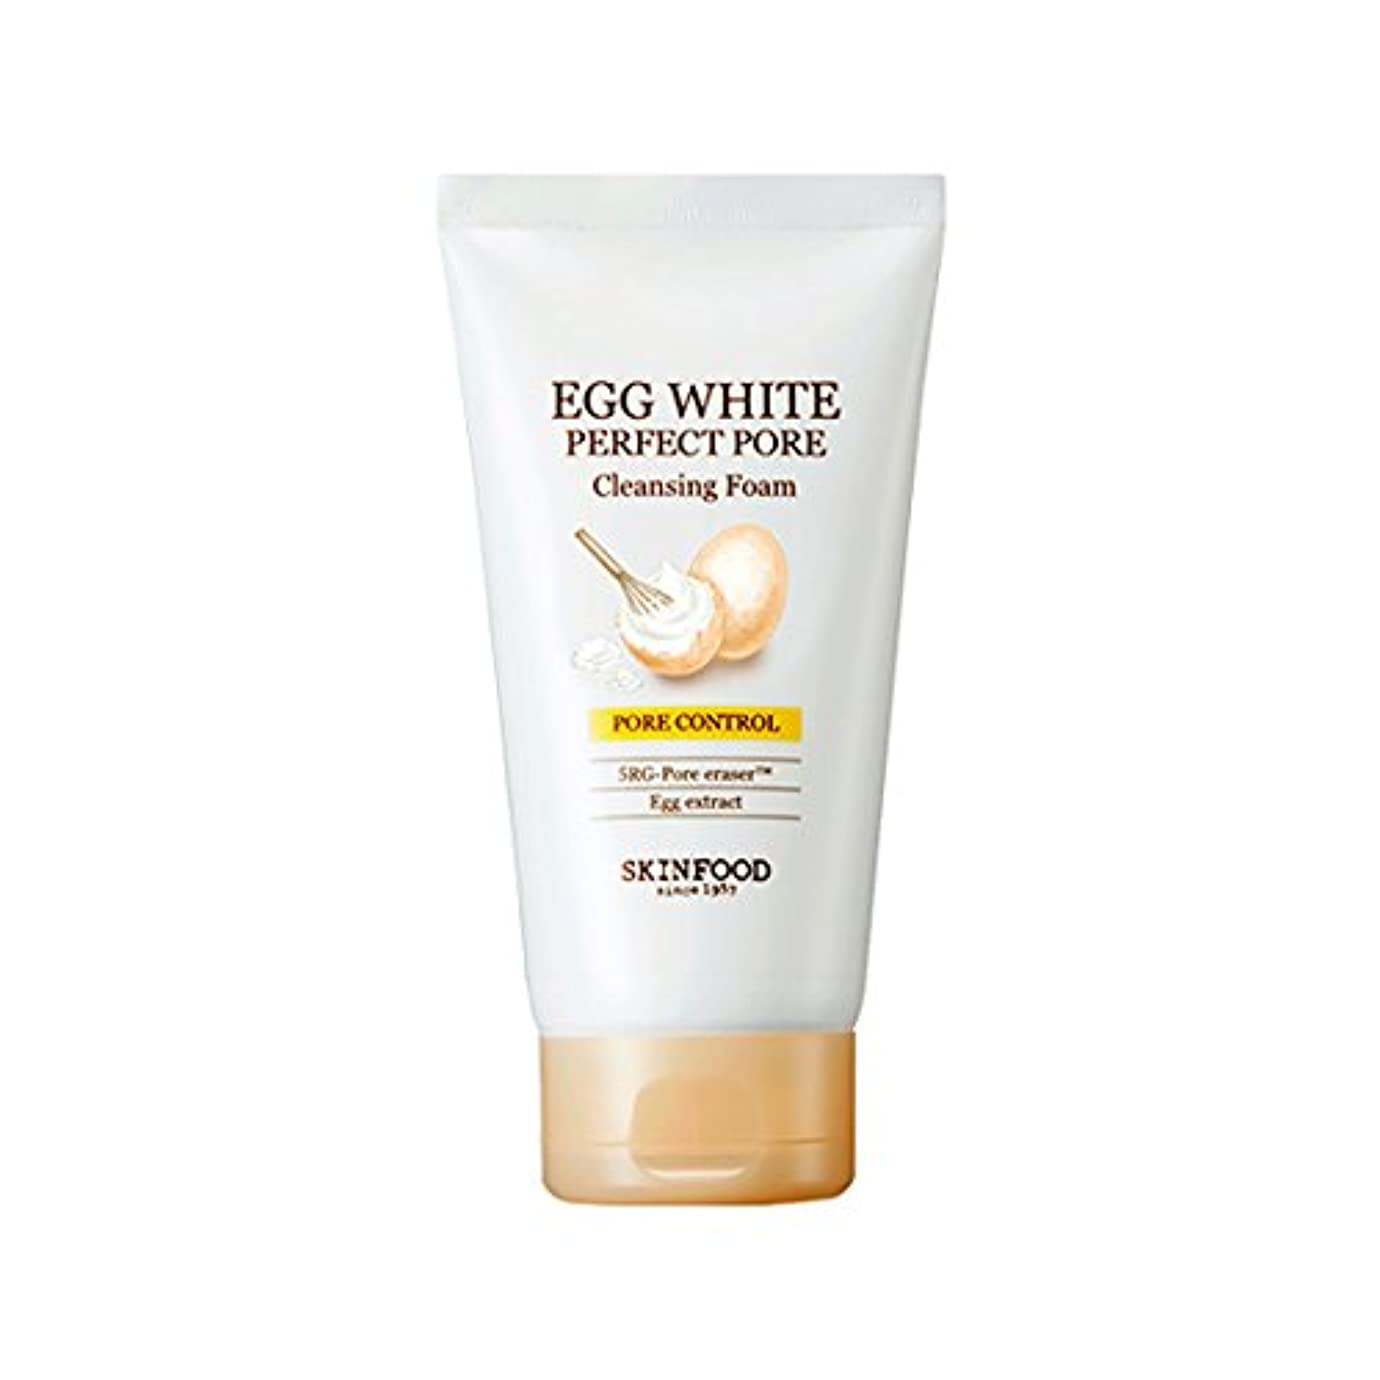 Skinfood/Egg White Perfect Pore Cleansing Foam/エッグホワイトパーフェクトポアクレンジングフォーム/150ml [並行輸入品]